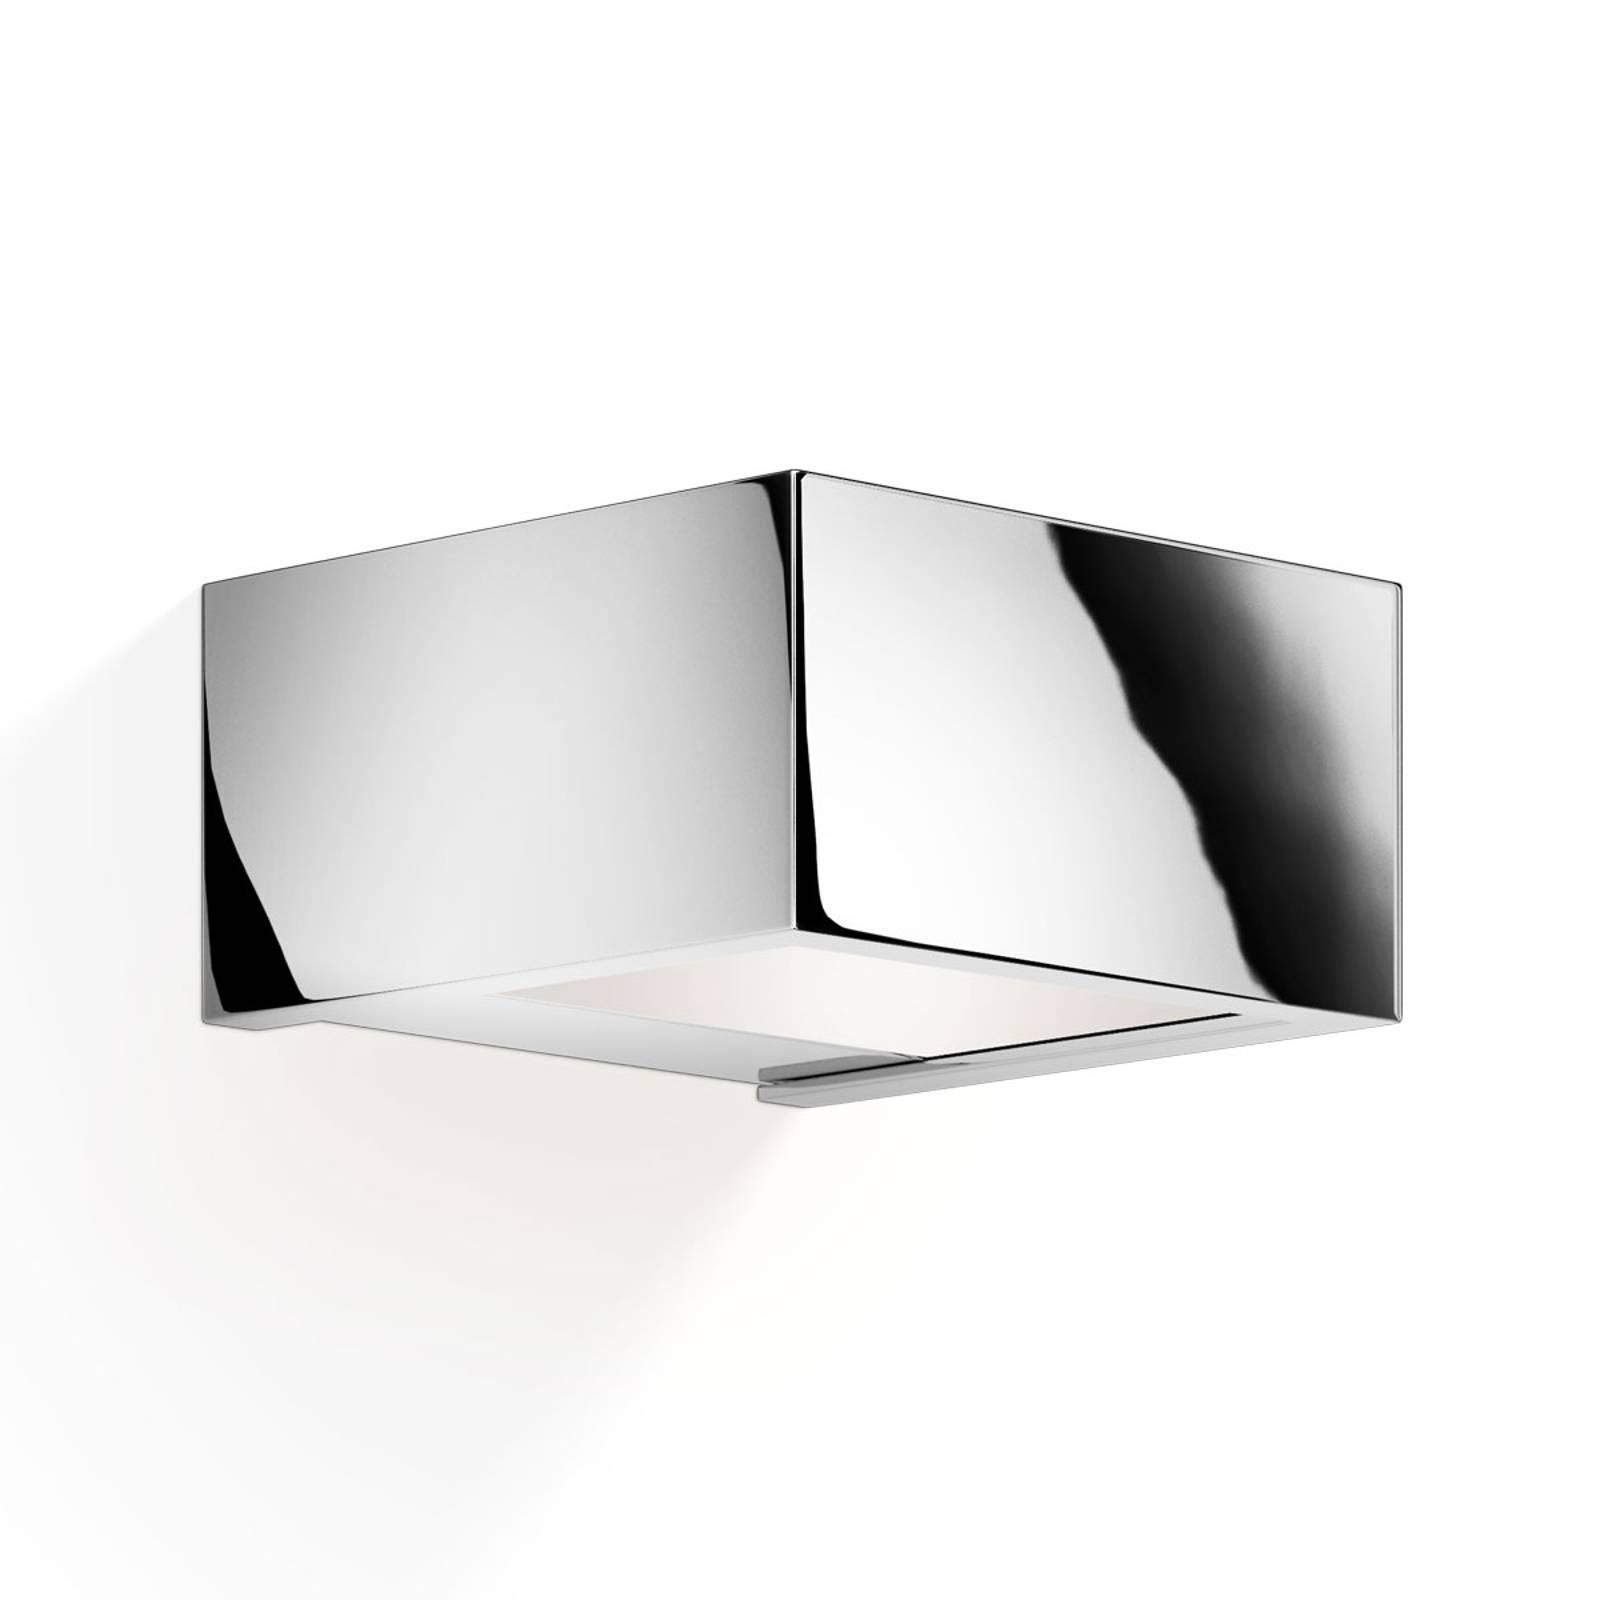 Decor Walther Box 10 seinävalaisin